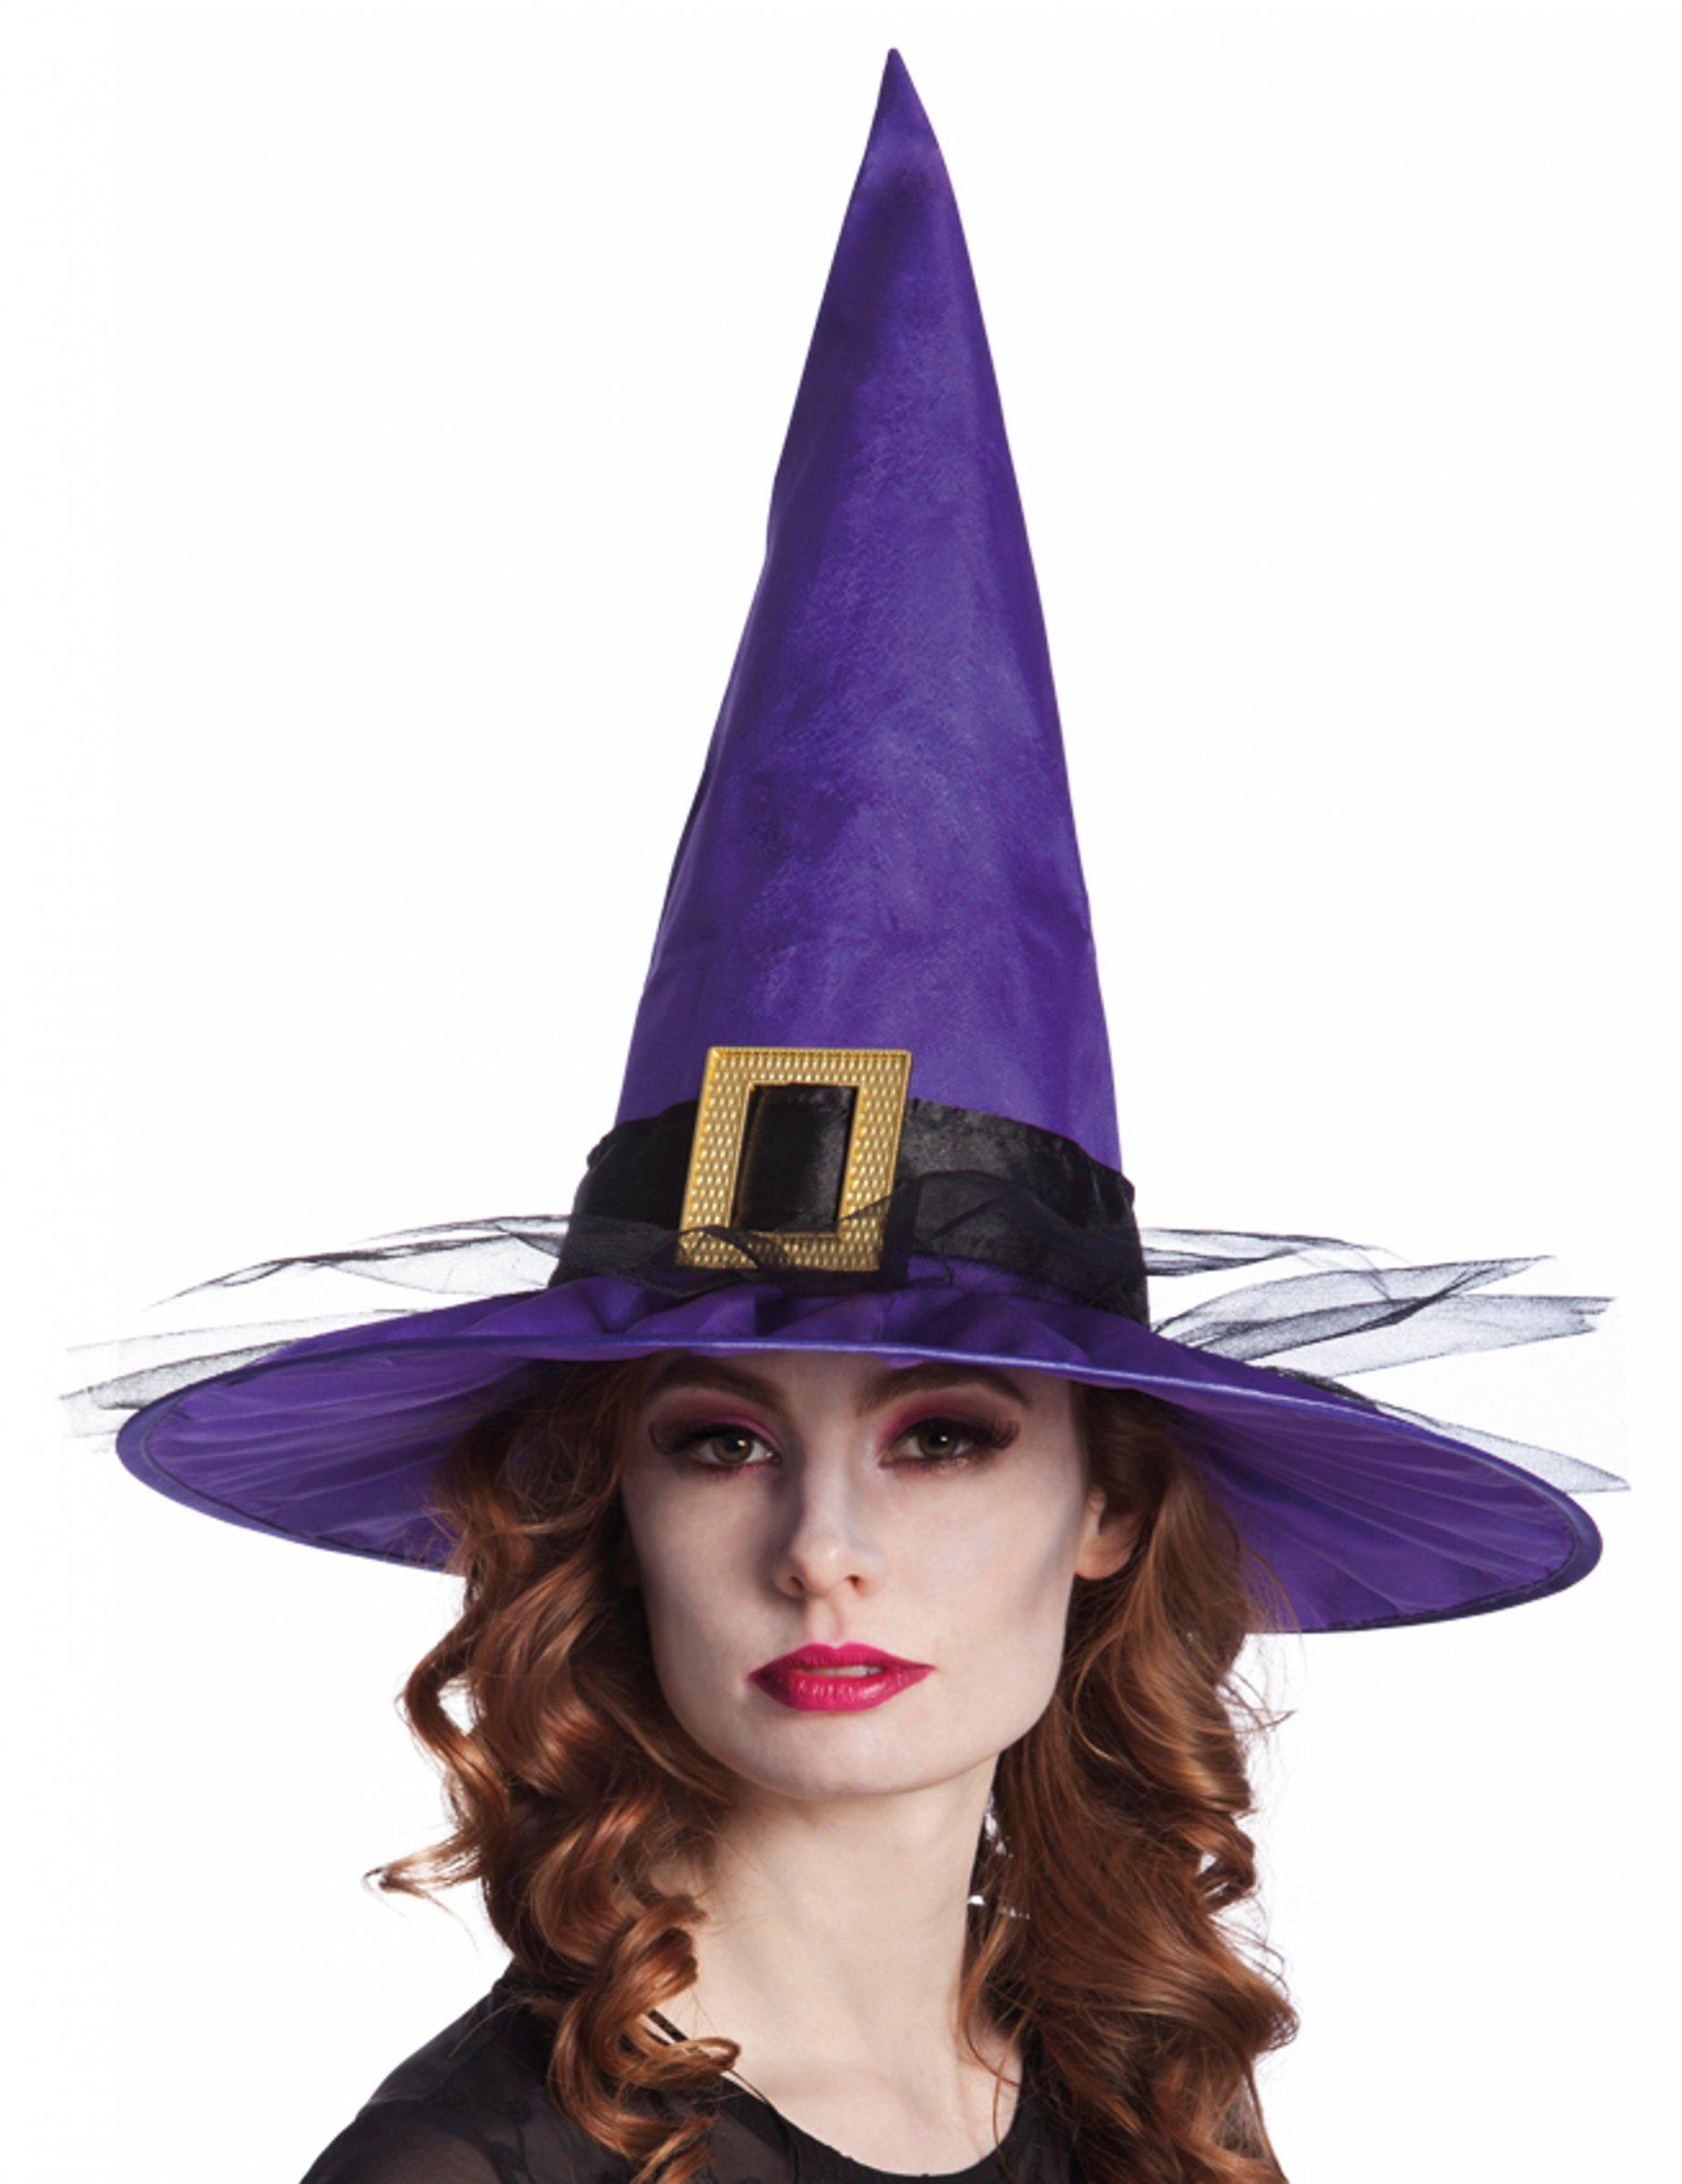 Sombrero bruja terciopelo con hebilla adulto Halloween  Sombreros c18804096e7